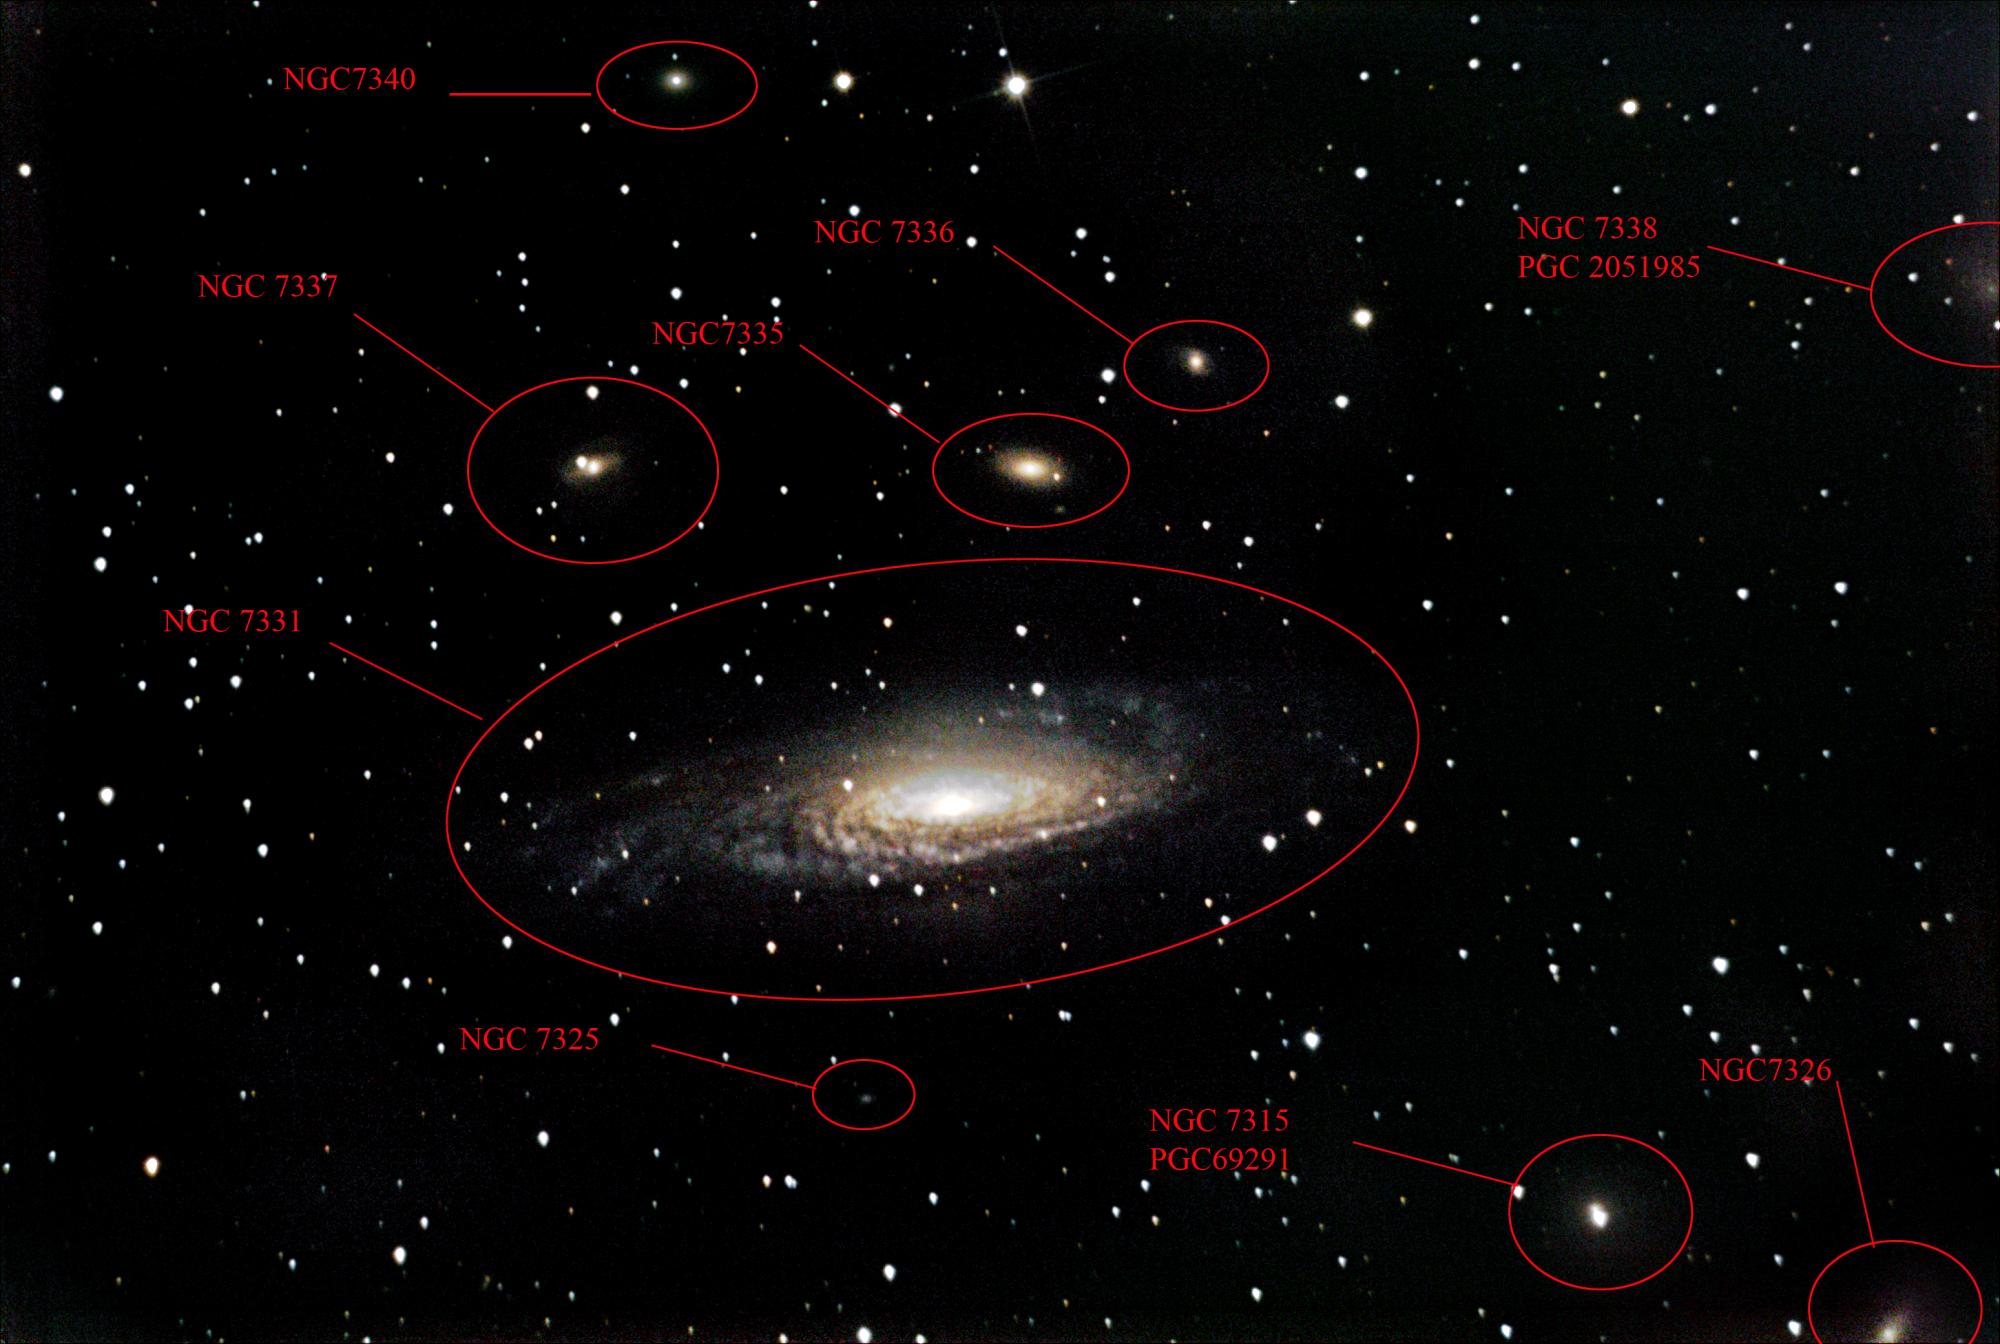 NGC7331-details.thumb.png.2c9b1f3969b0b6357dd0988566b2f7ea.png